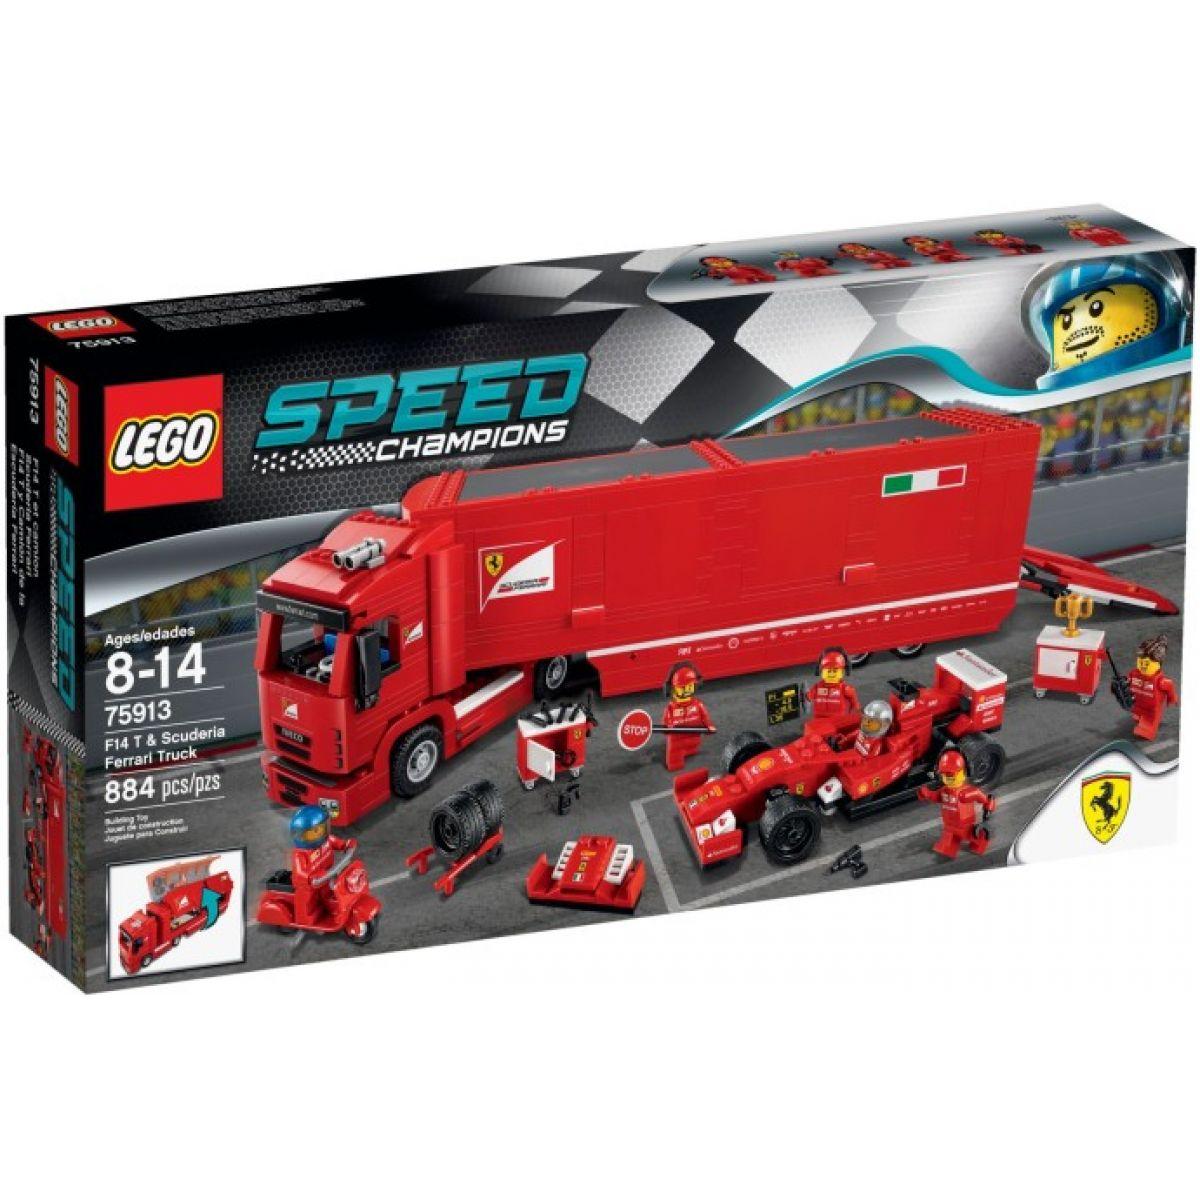 LEGO Speed Champions 75913 - Kamión pro vůz F14 T týmu Scuderia Ferrari